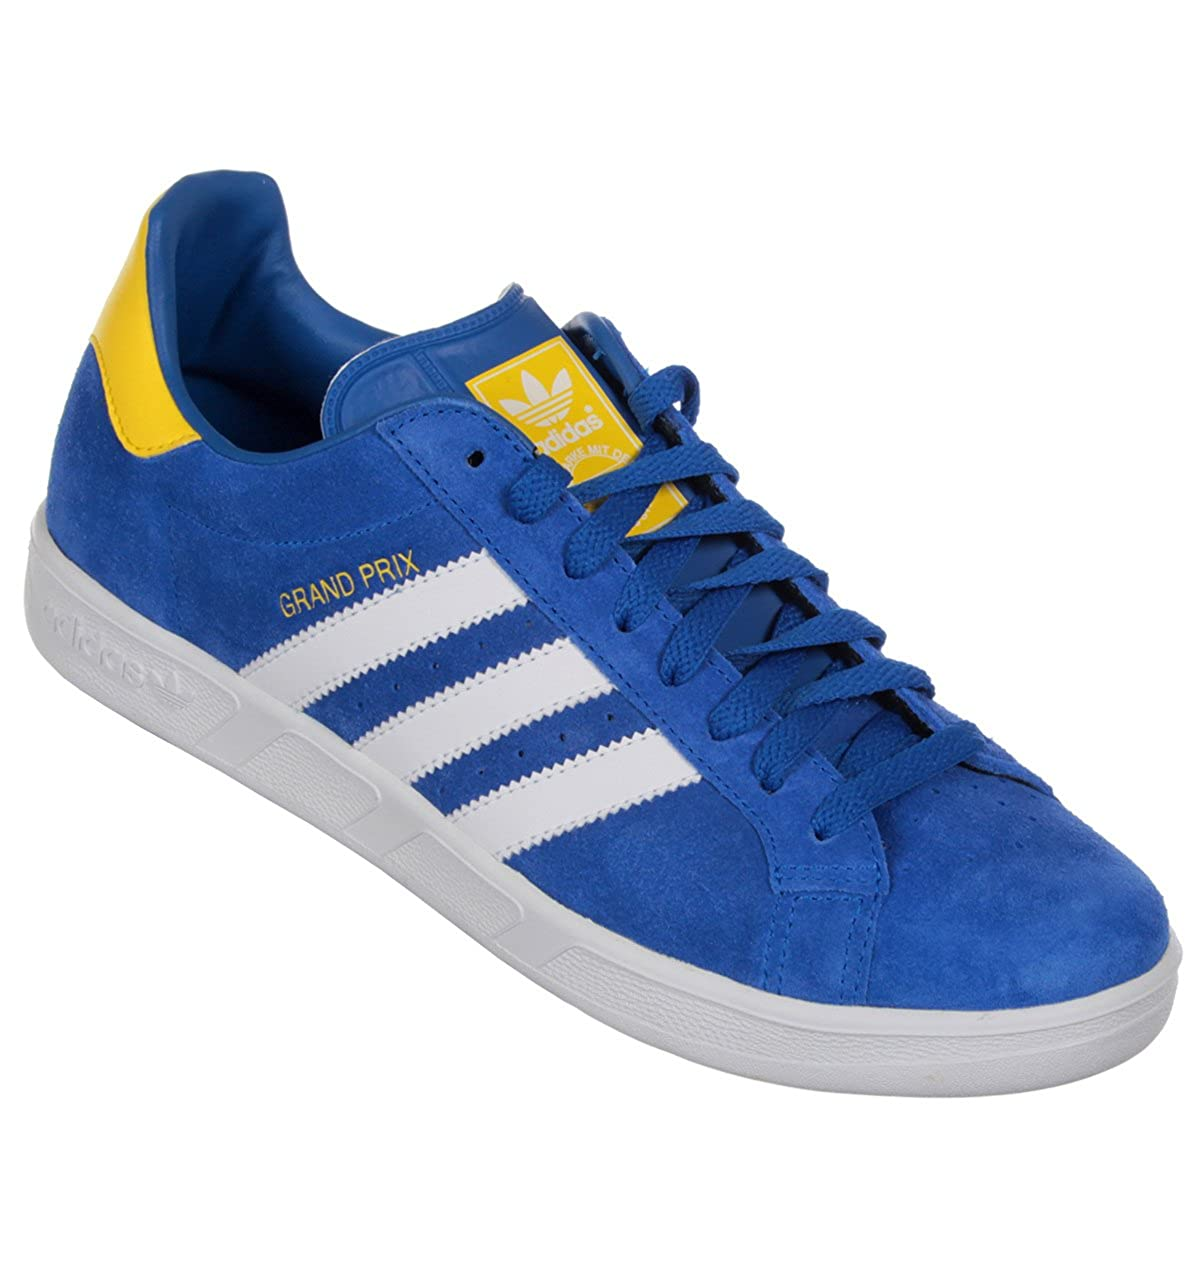 new arrivals 4565e 47578 Adidas Originals Grand Prix Classic Daily Suede Trainers Mens (UK 10.5 (  EUR 45) Amazon.co.uk Shoes  Bags